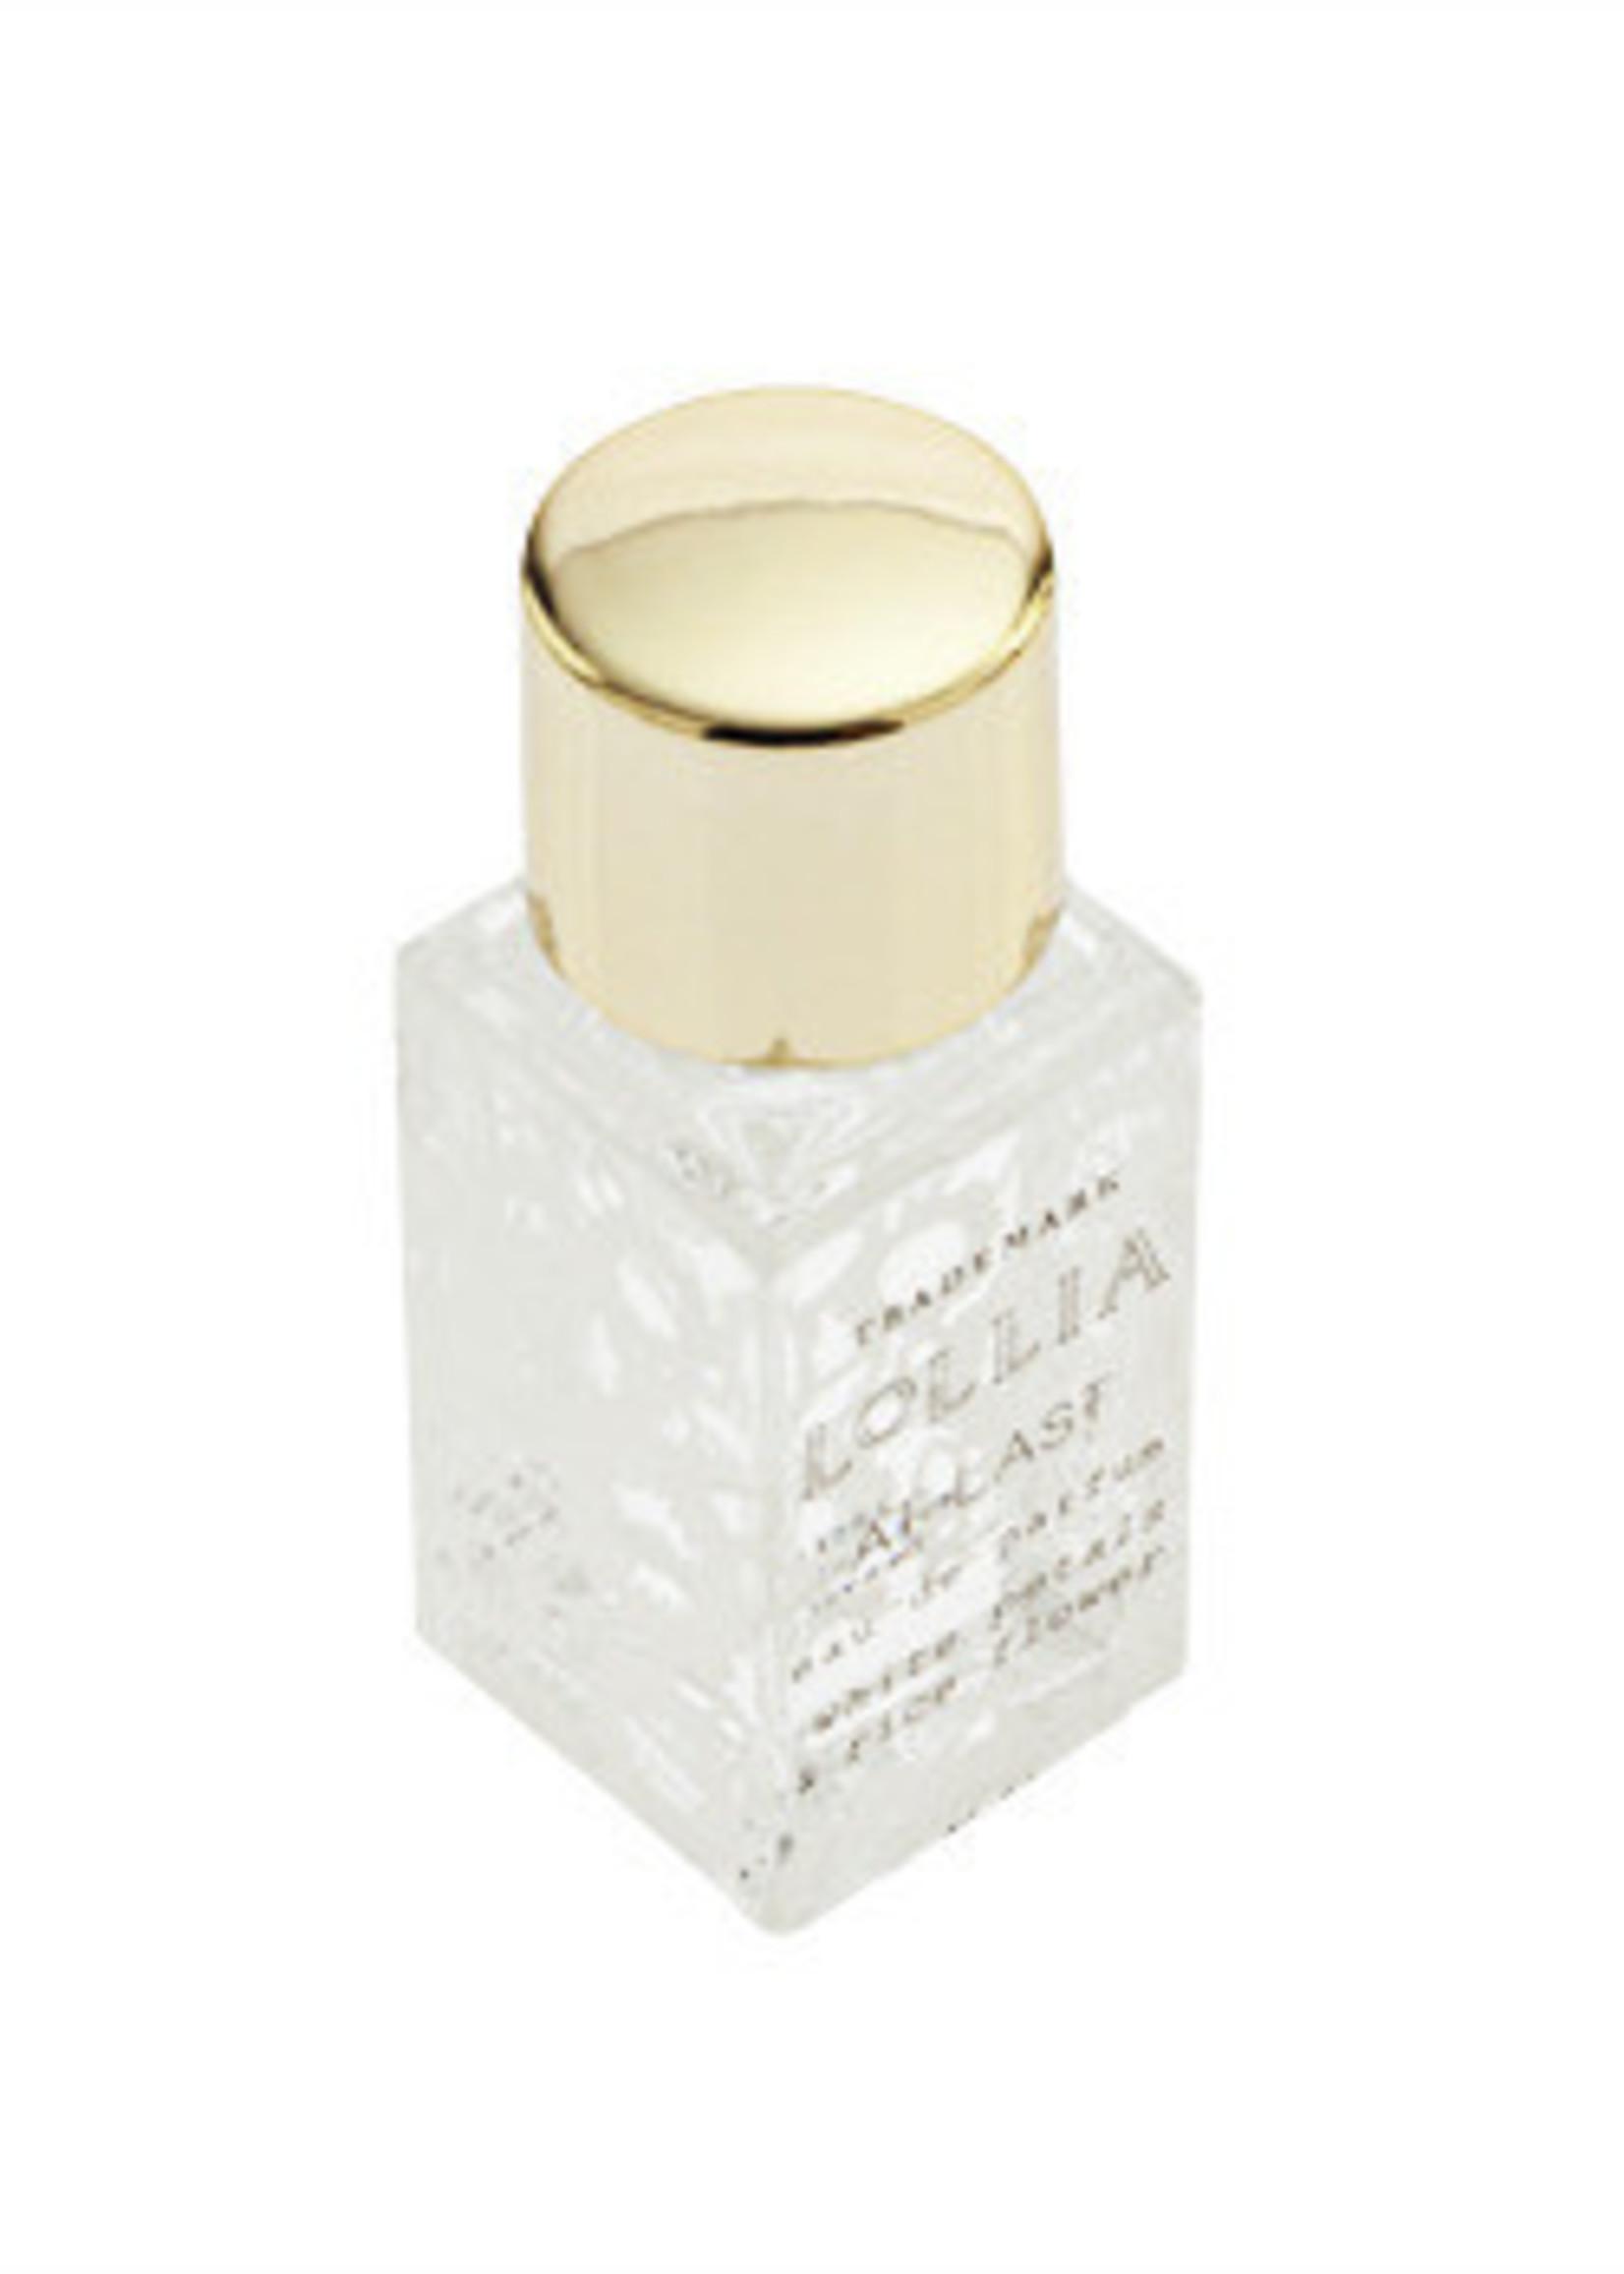 lollia at last little luxe perfume